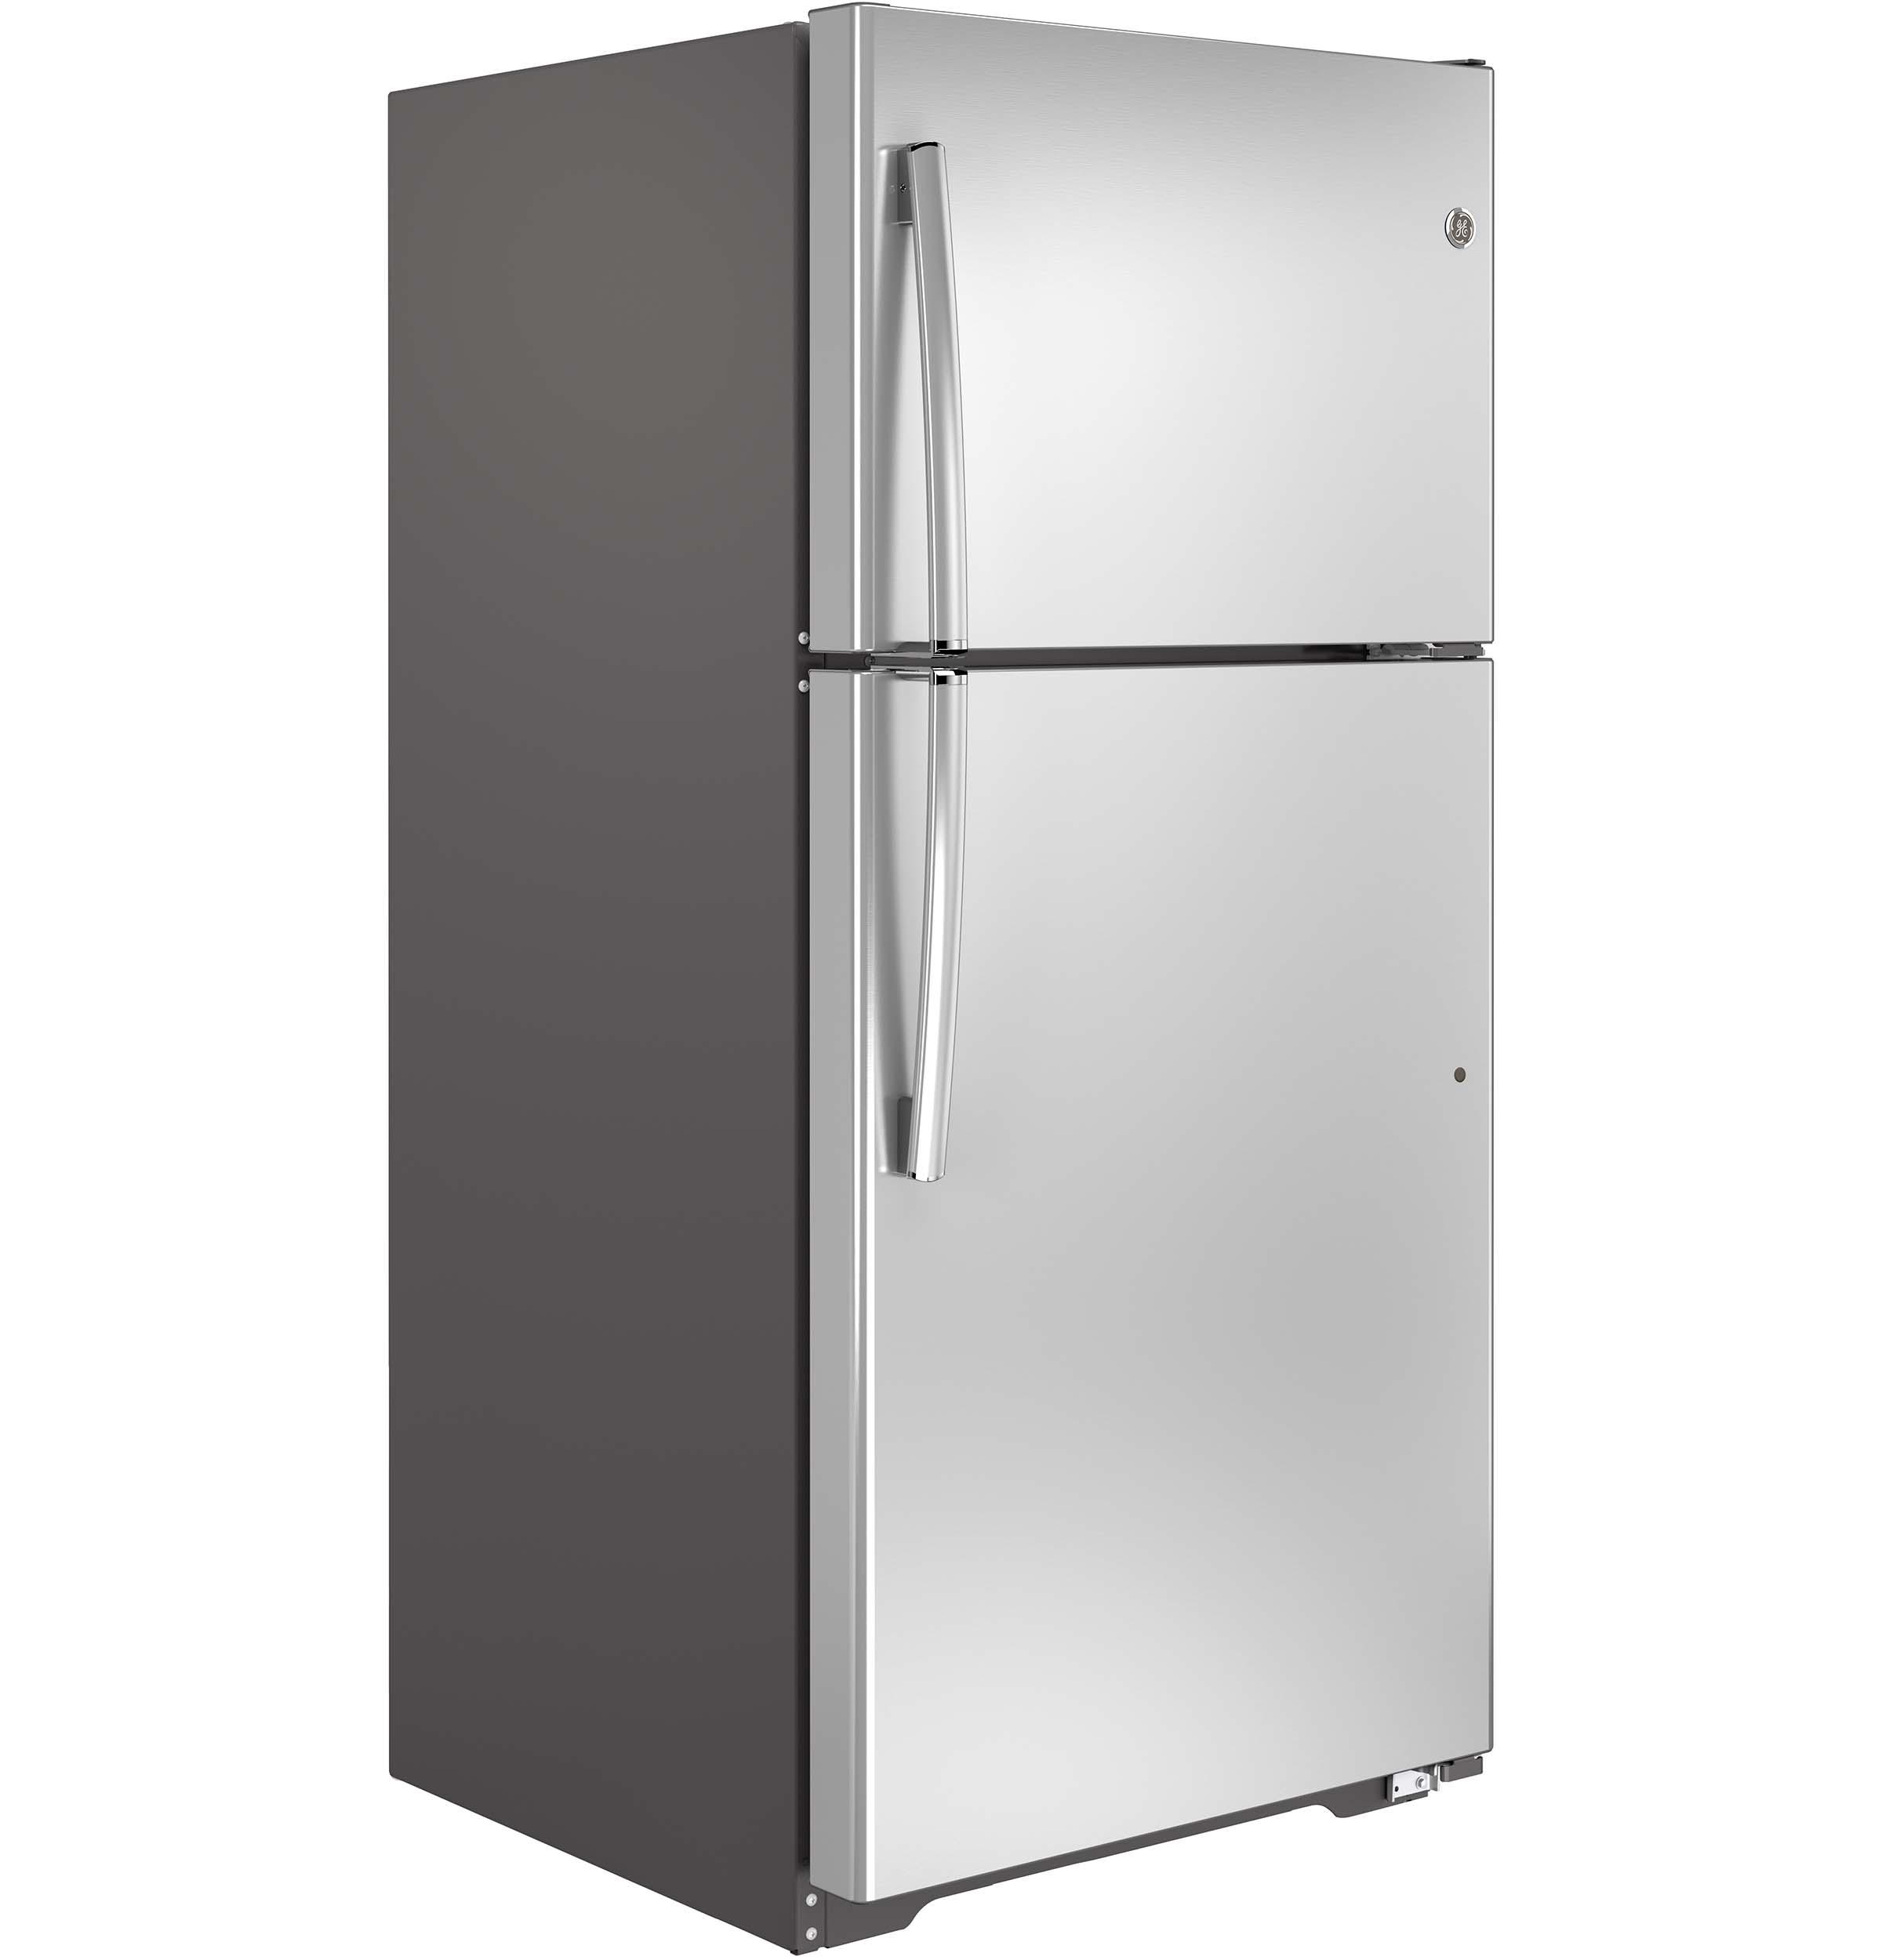 GE Appliances GTE18ISHSS 18.2 cu. ft. Top-Freezer Refrigerator - Stainless Steel